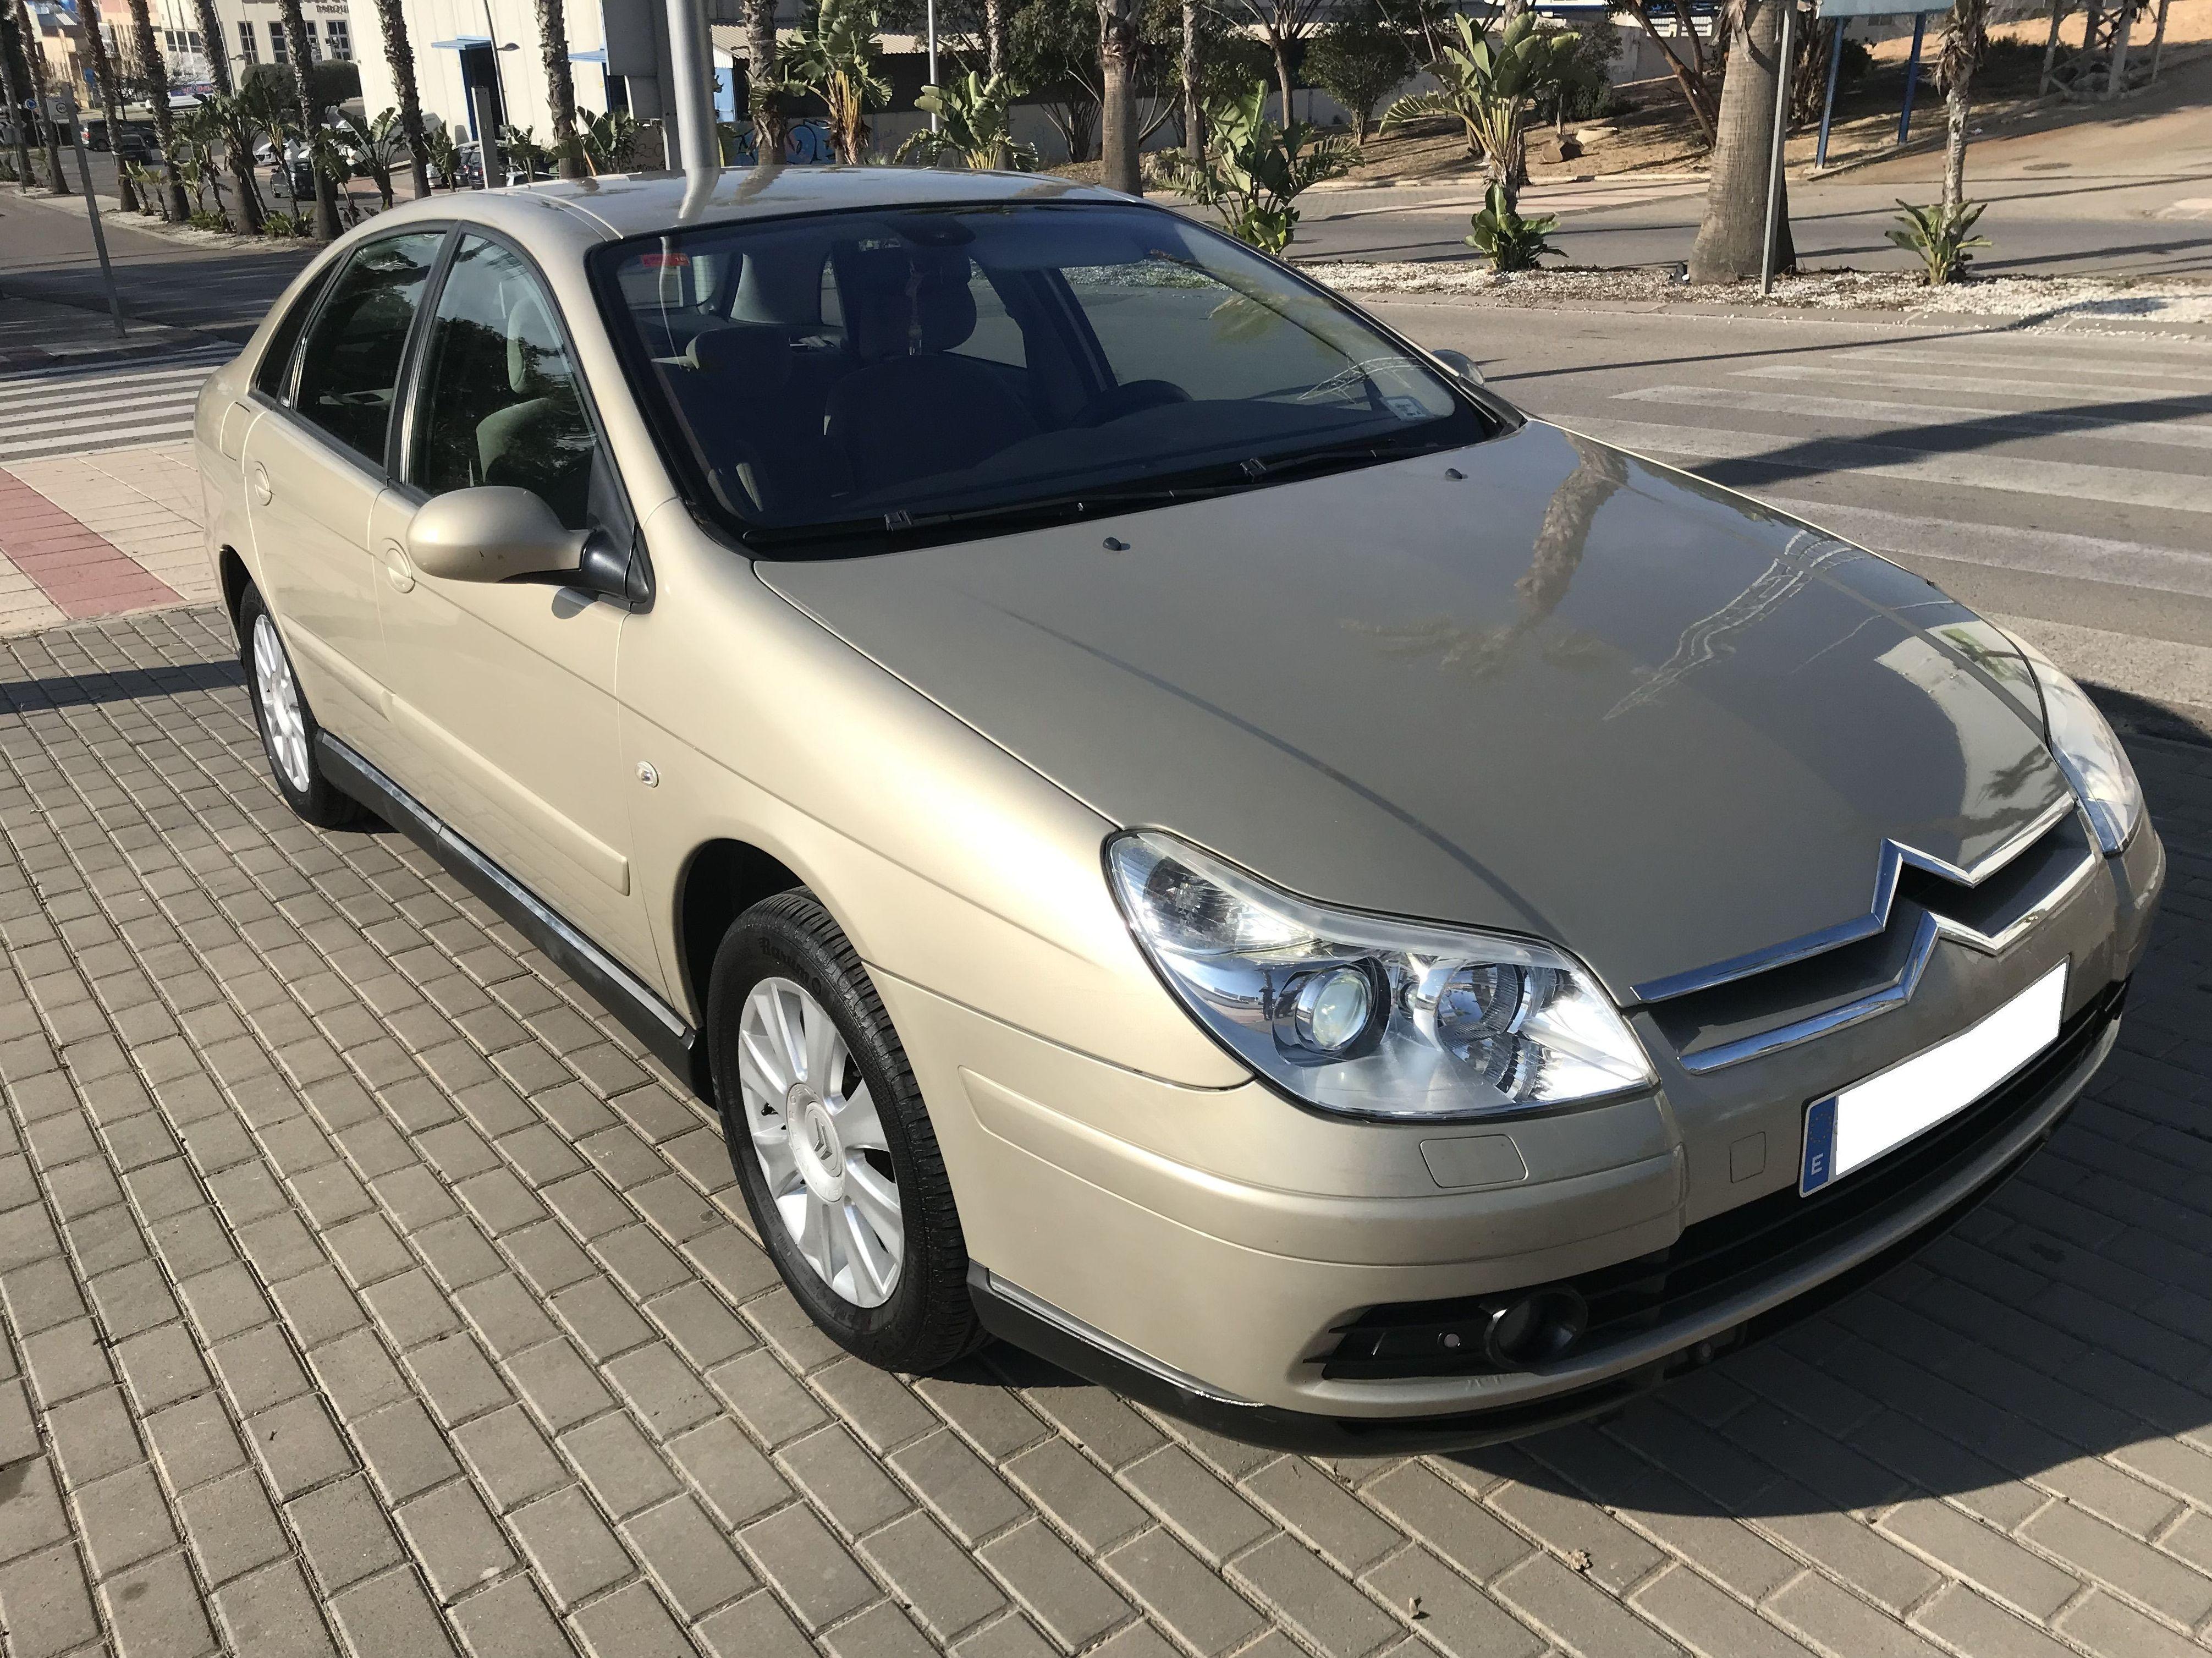 CITROËN C5 HDI: COCHES DE OCASION de Automóviles Mediterráneo